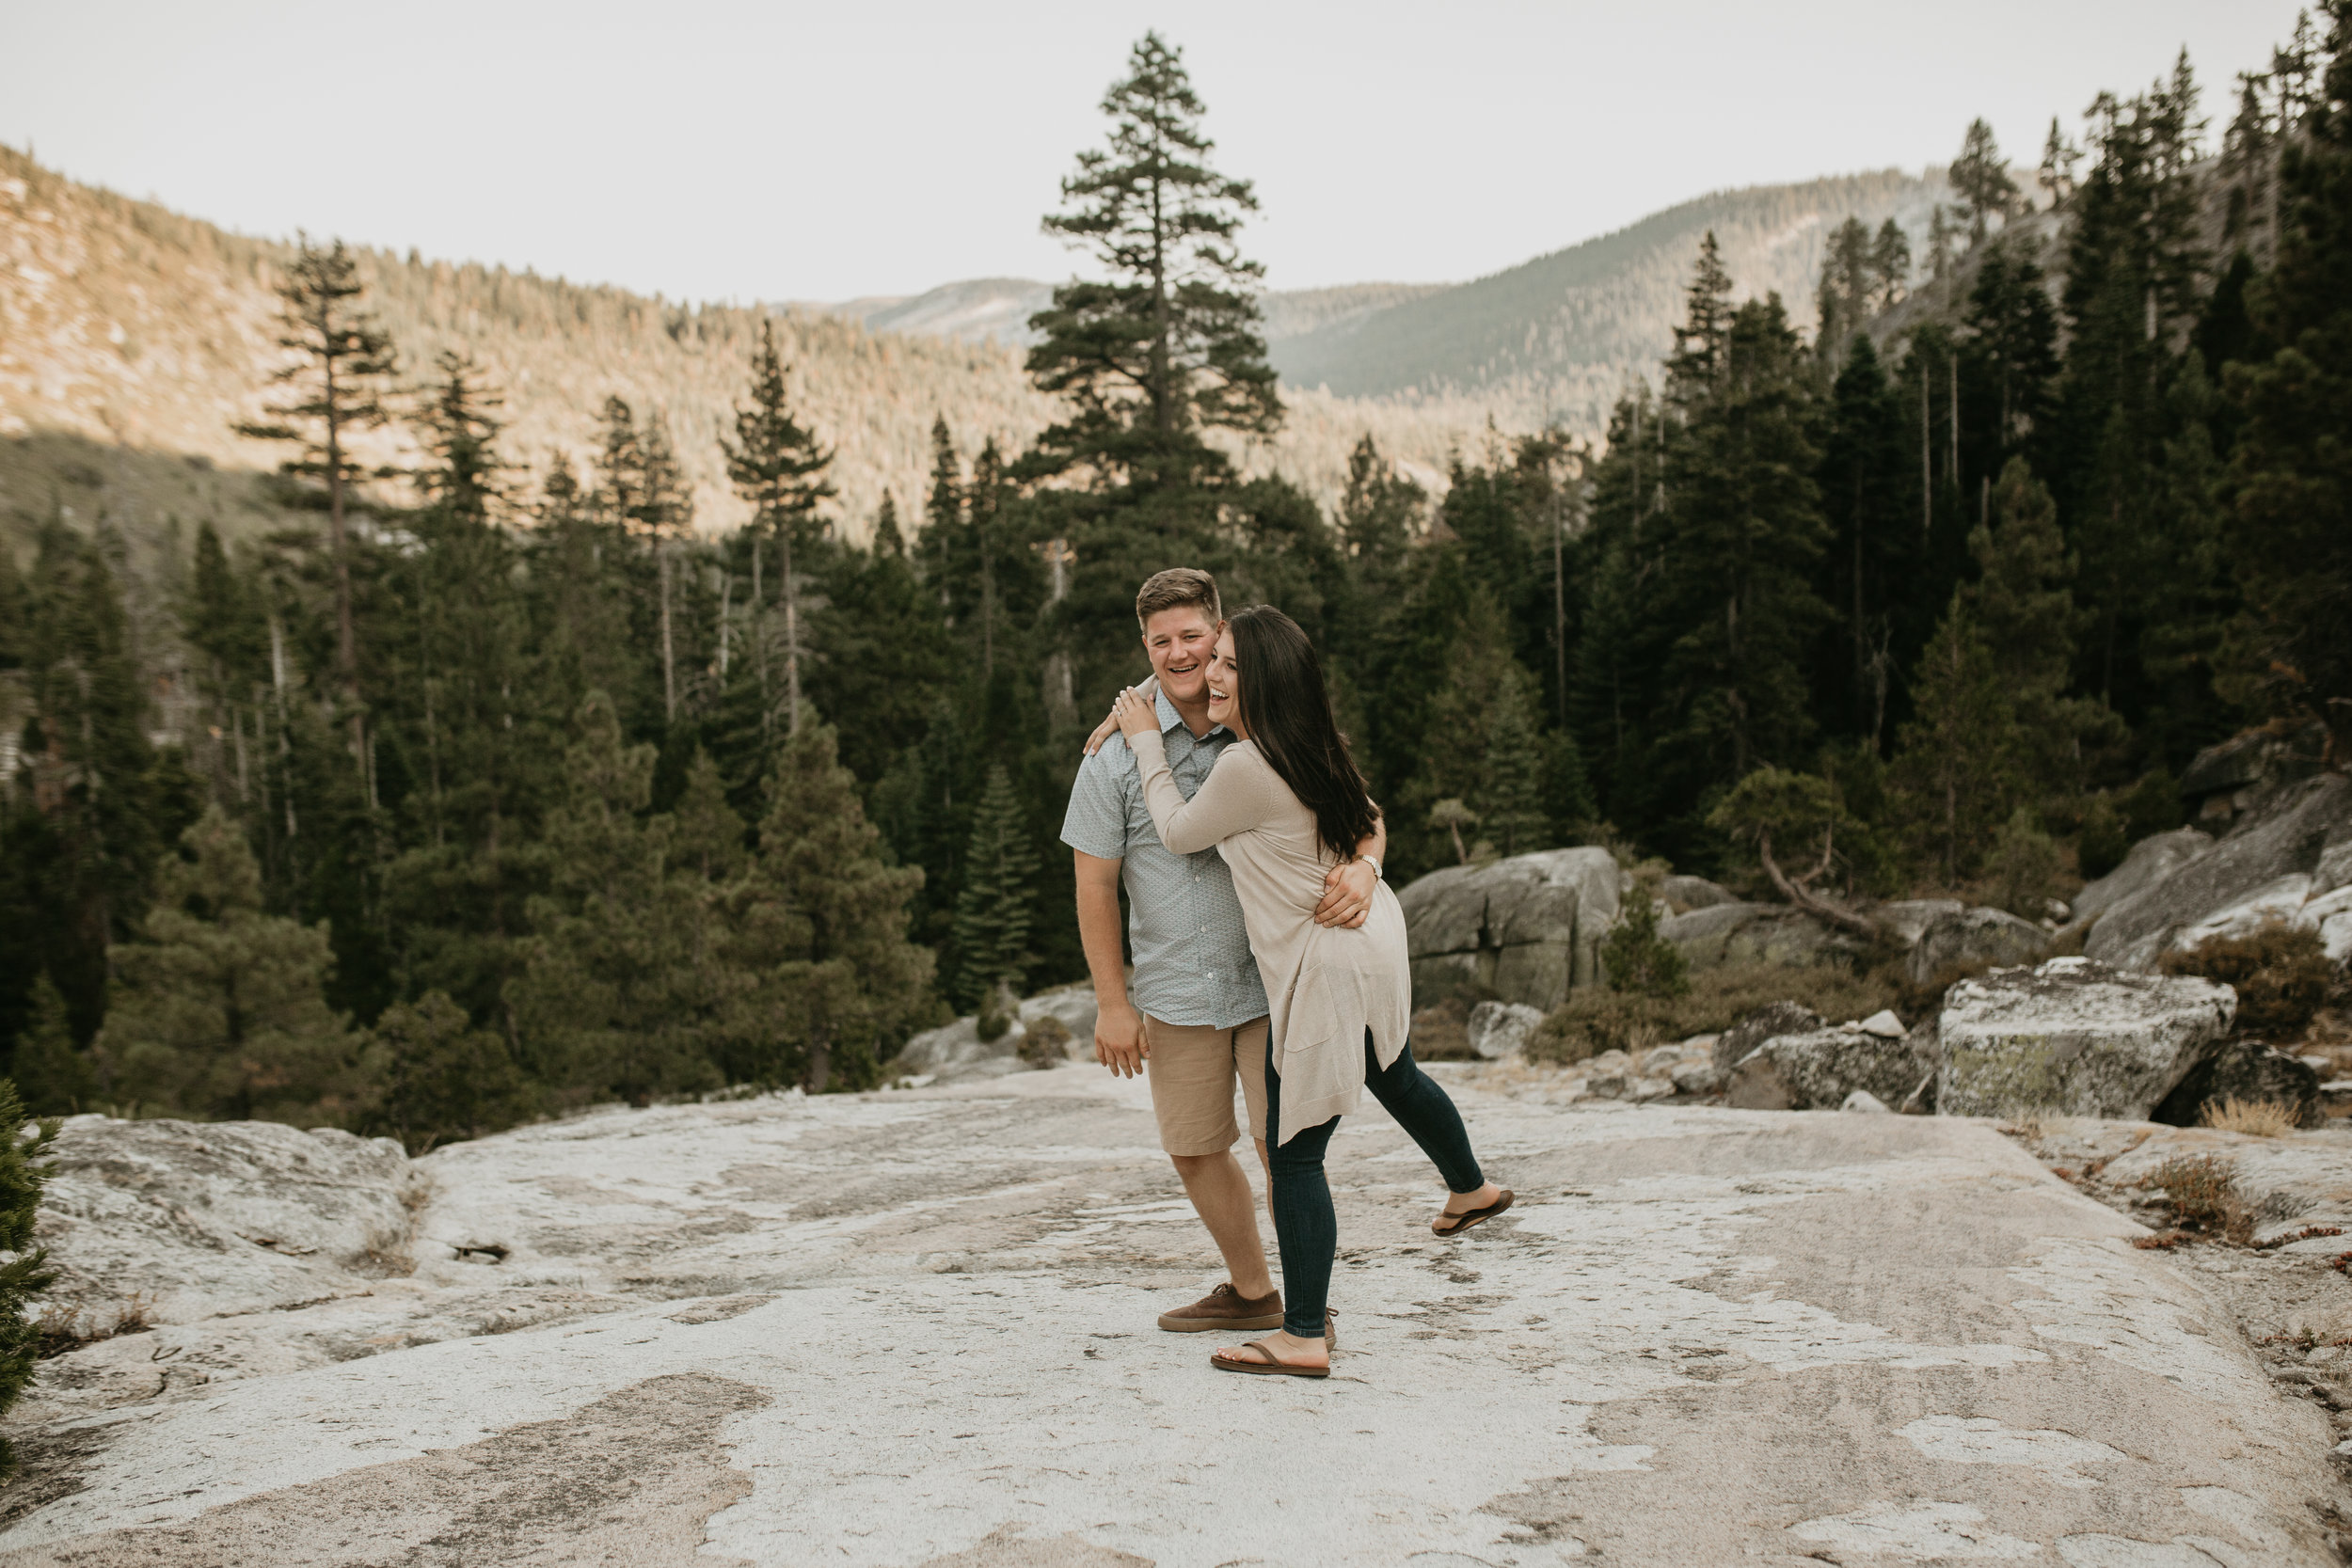 nicole-daacke-photography-fun-adventure-session-waterfall-lake-tahoe-sunset-destination-wedding-photographer-northern-california-elopement-photographer-7.jpg